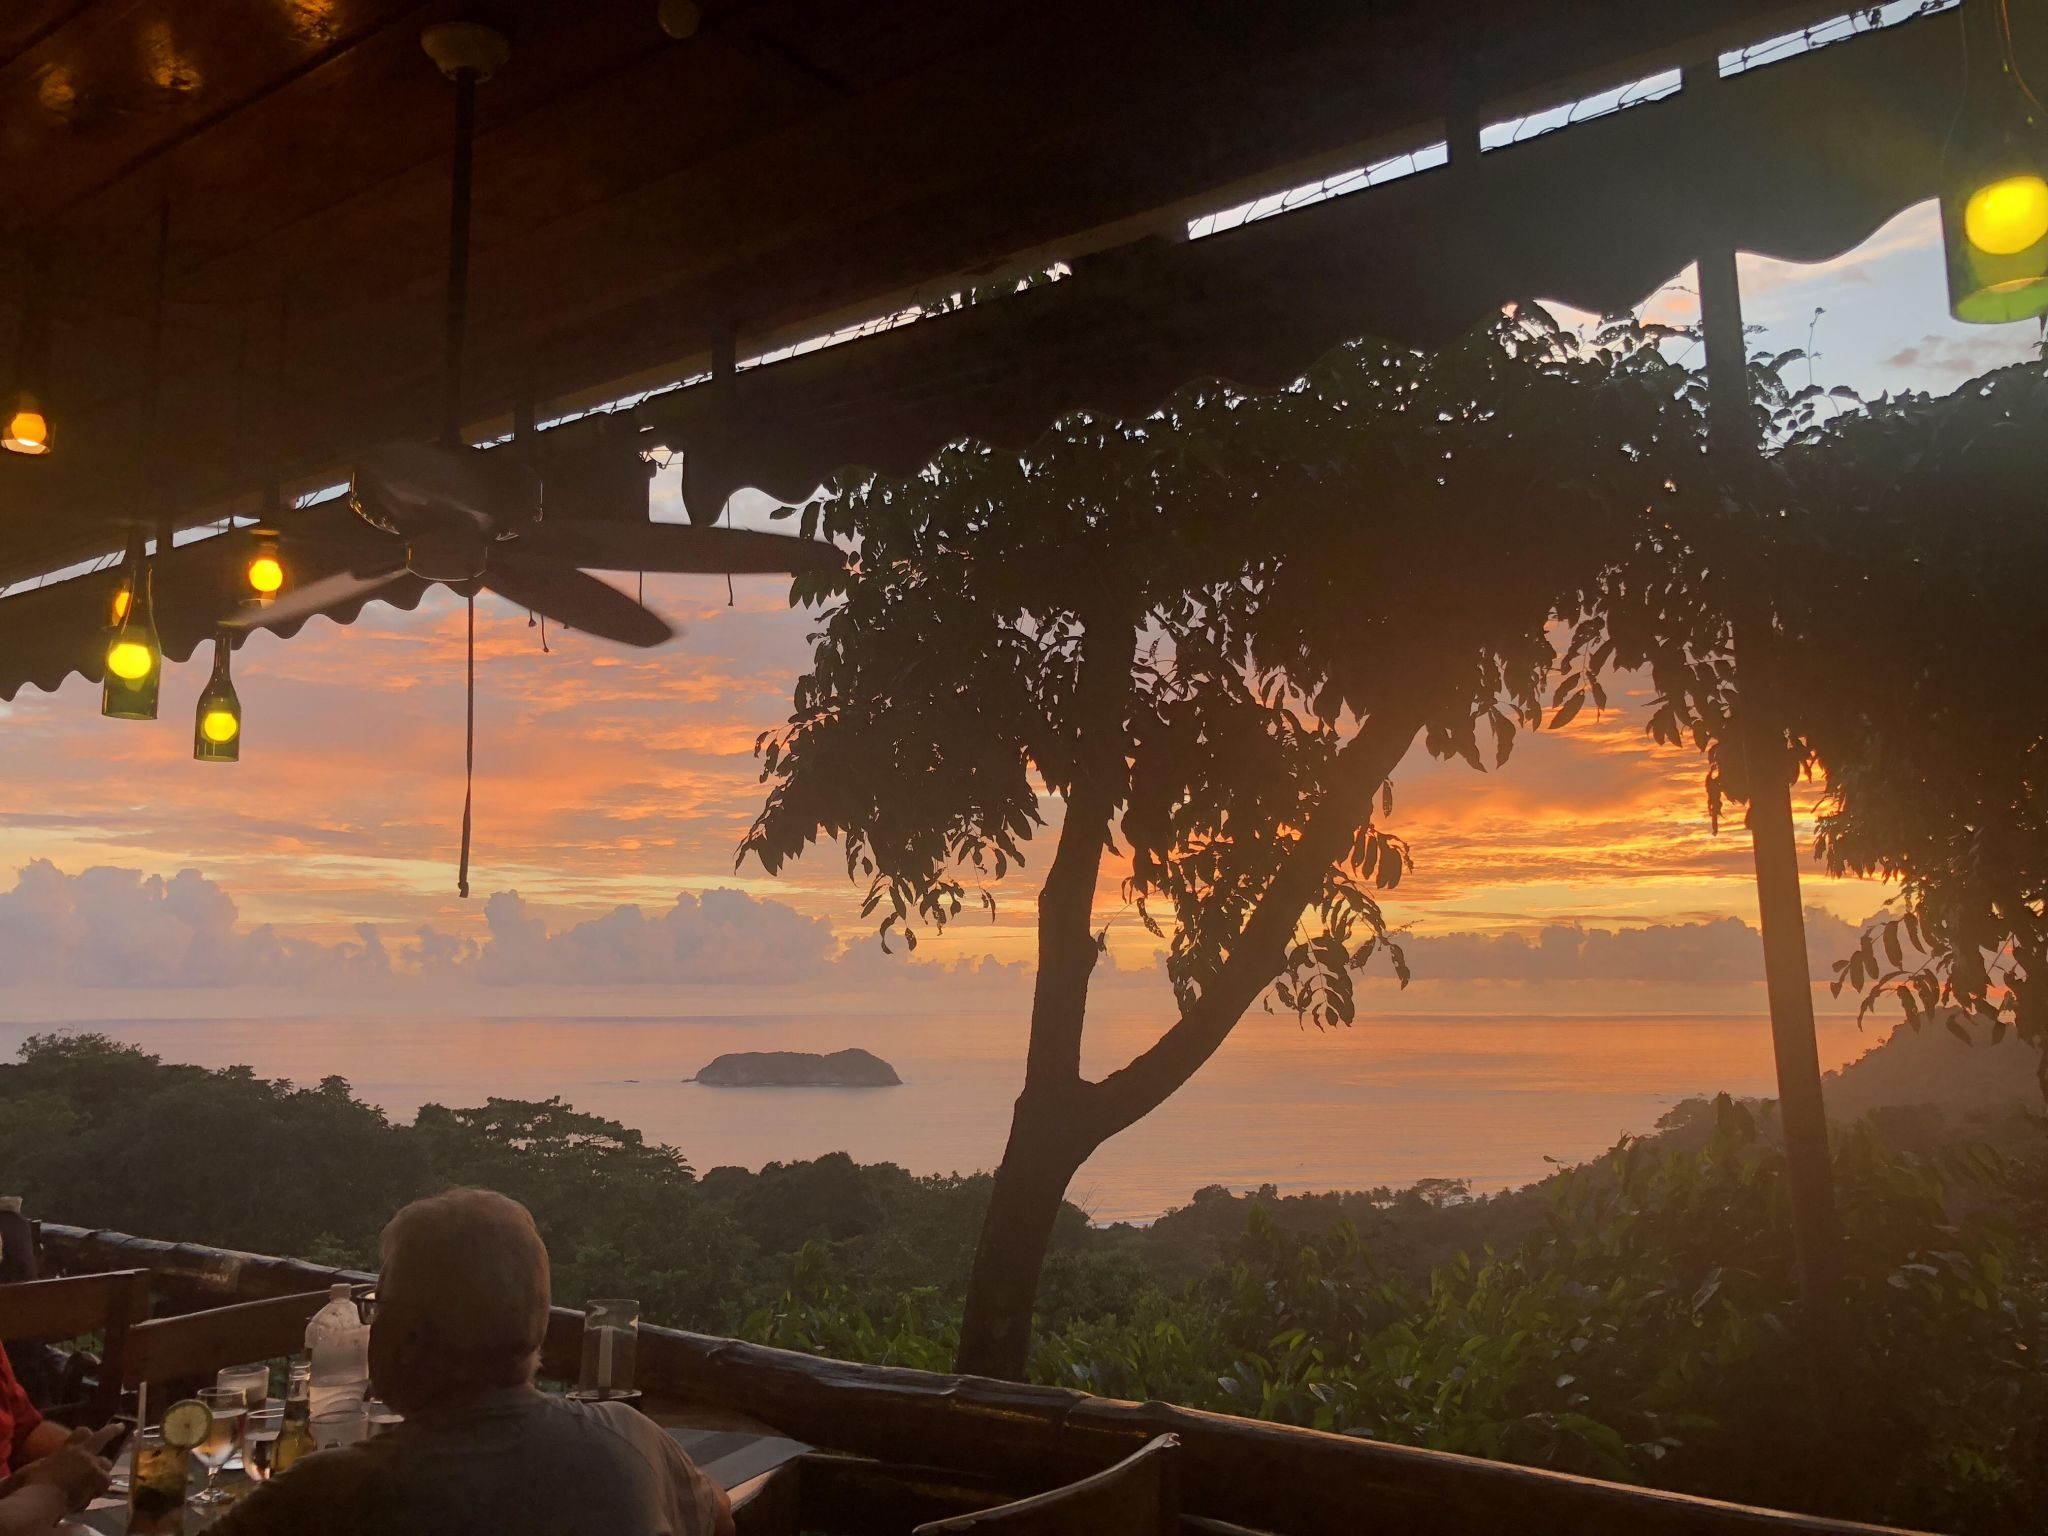 Manuel Antonio Costa Rica Travel Guide